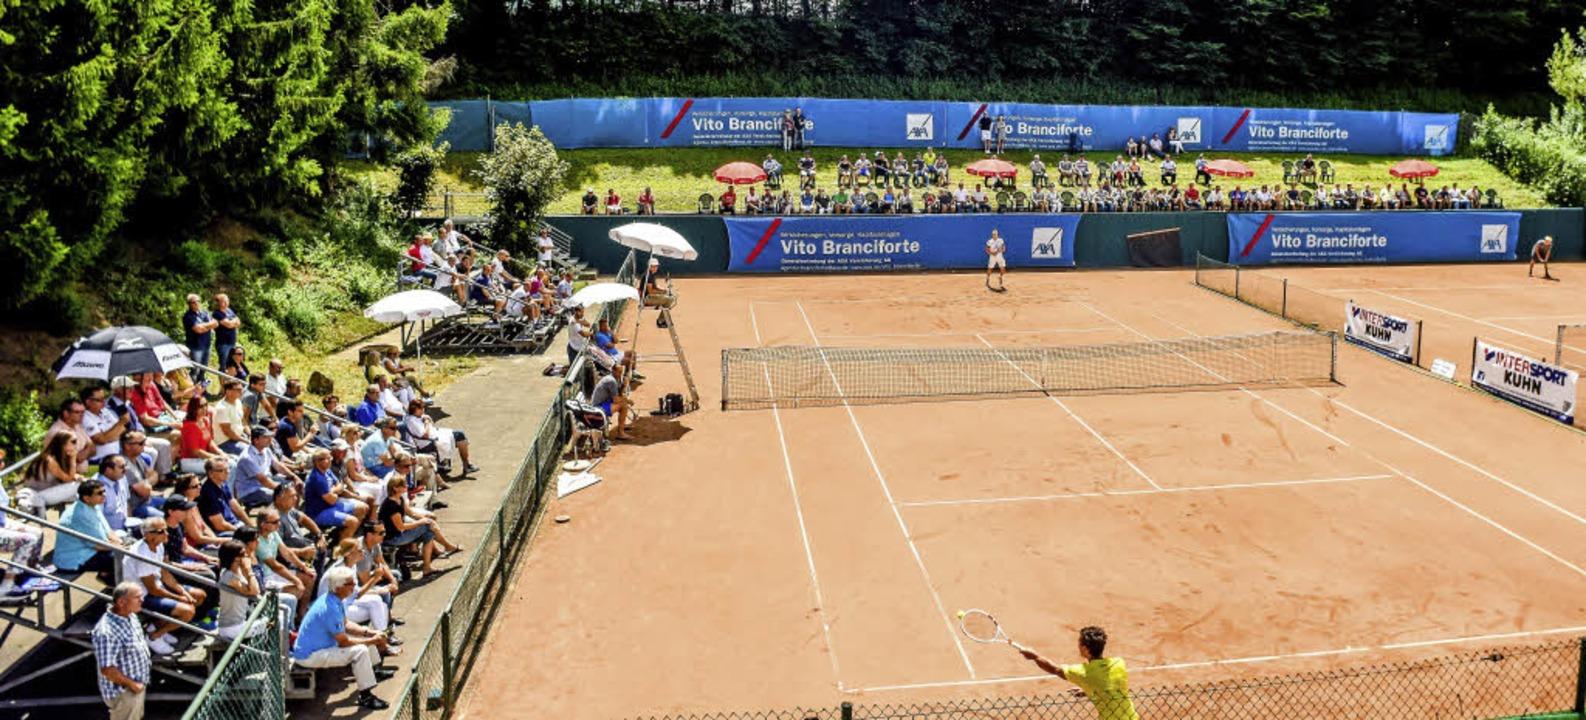 Sonnige Momentaufnahme des Tennisstadions an der Palmengasse   | Foto: Sebastian Köhli